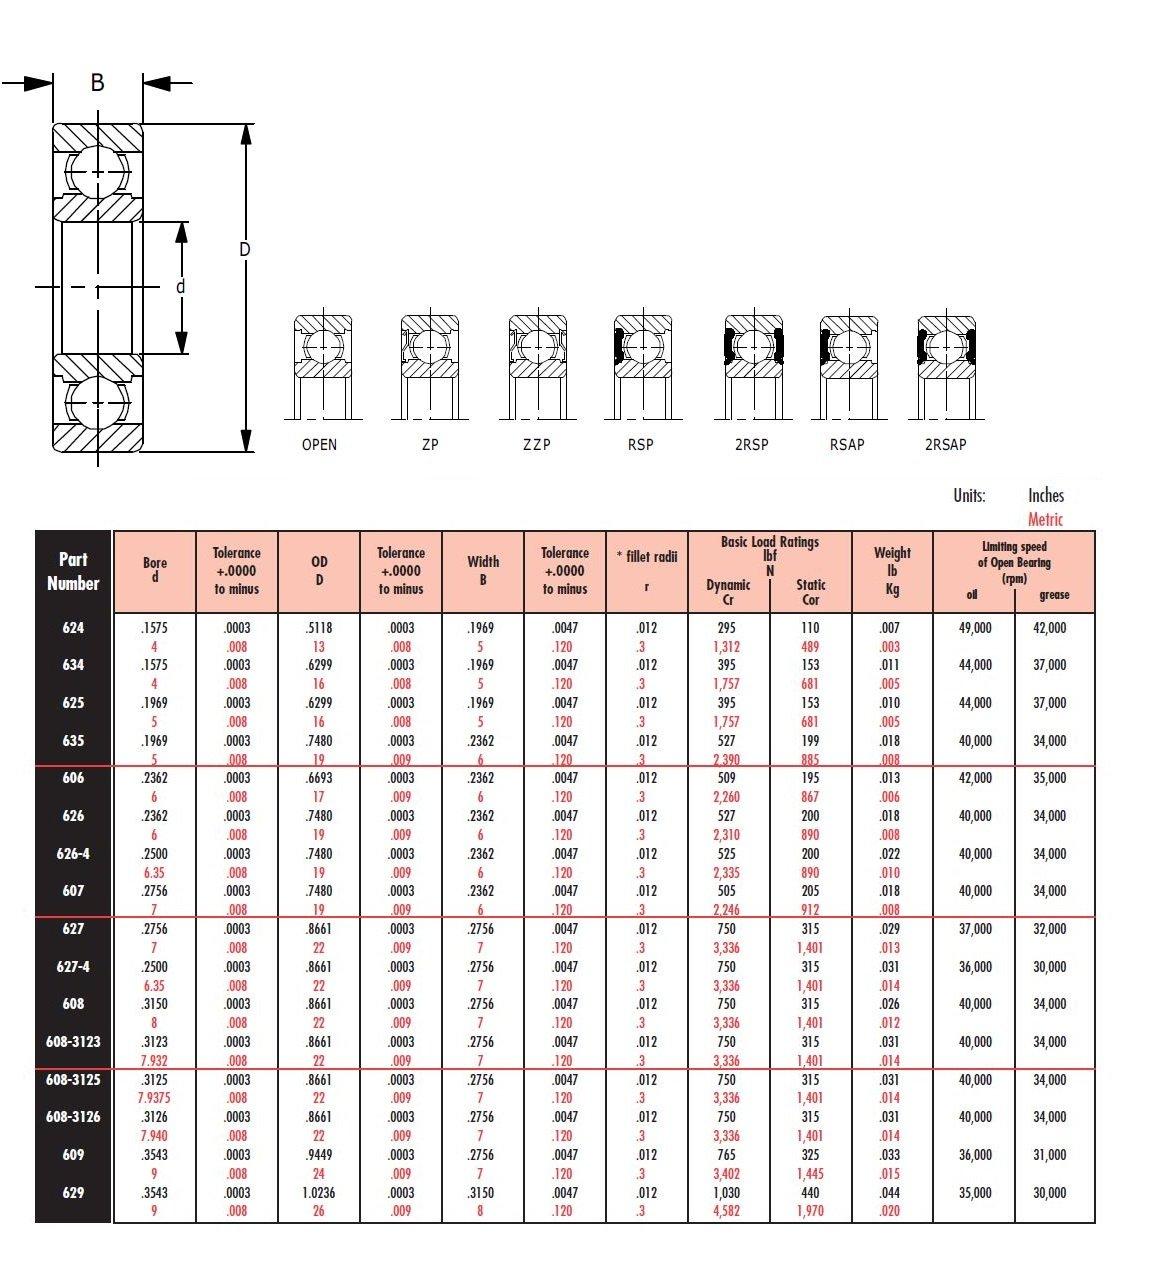 2160lbf Dynamic Load Capacity Metric 40mm OD 1030lbf Static Load Capacity Double Sheilded WJB 6203-ZZ Deep Groove Ball Bearing 17mm ID 12mm Width